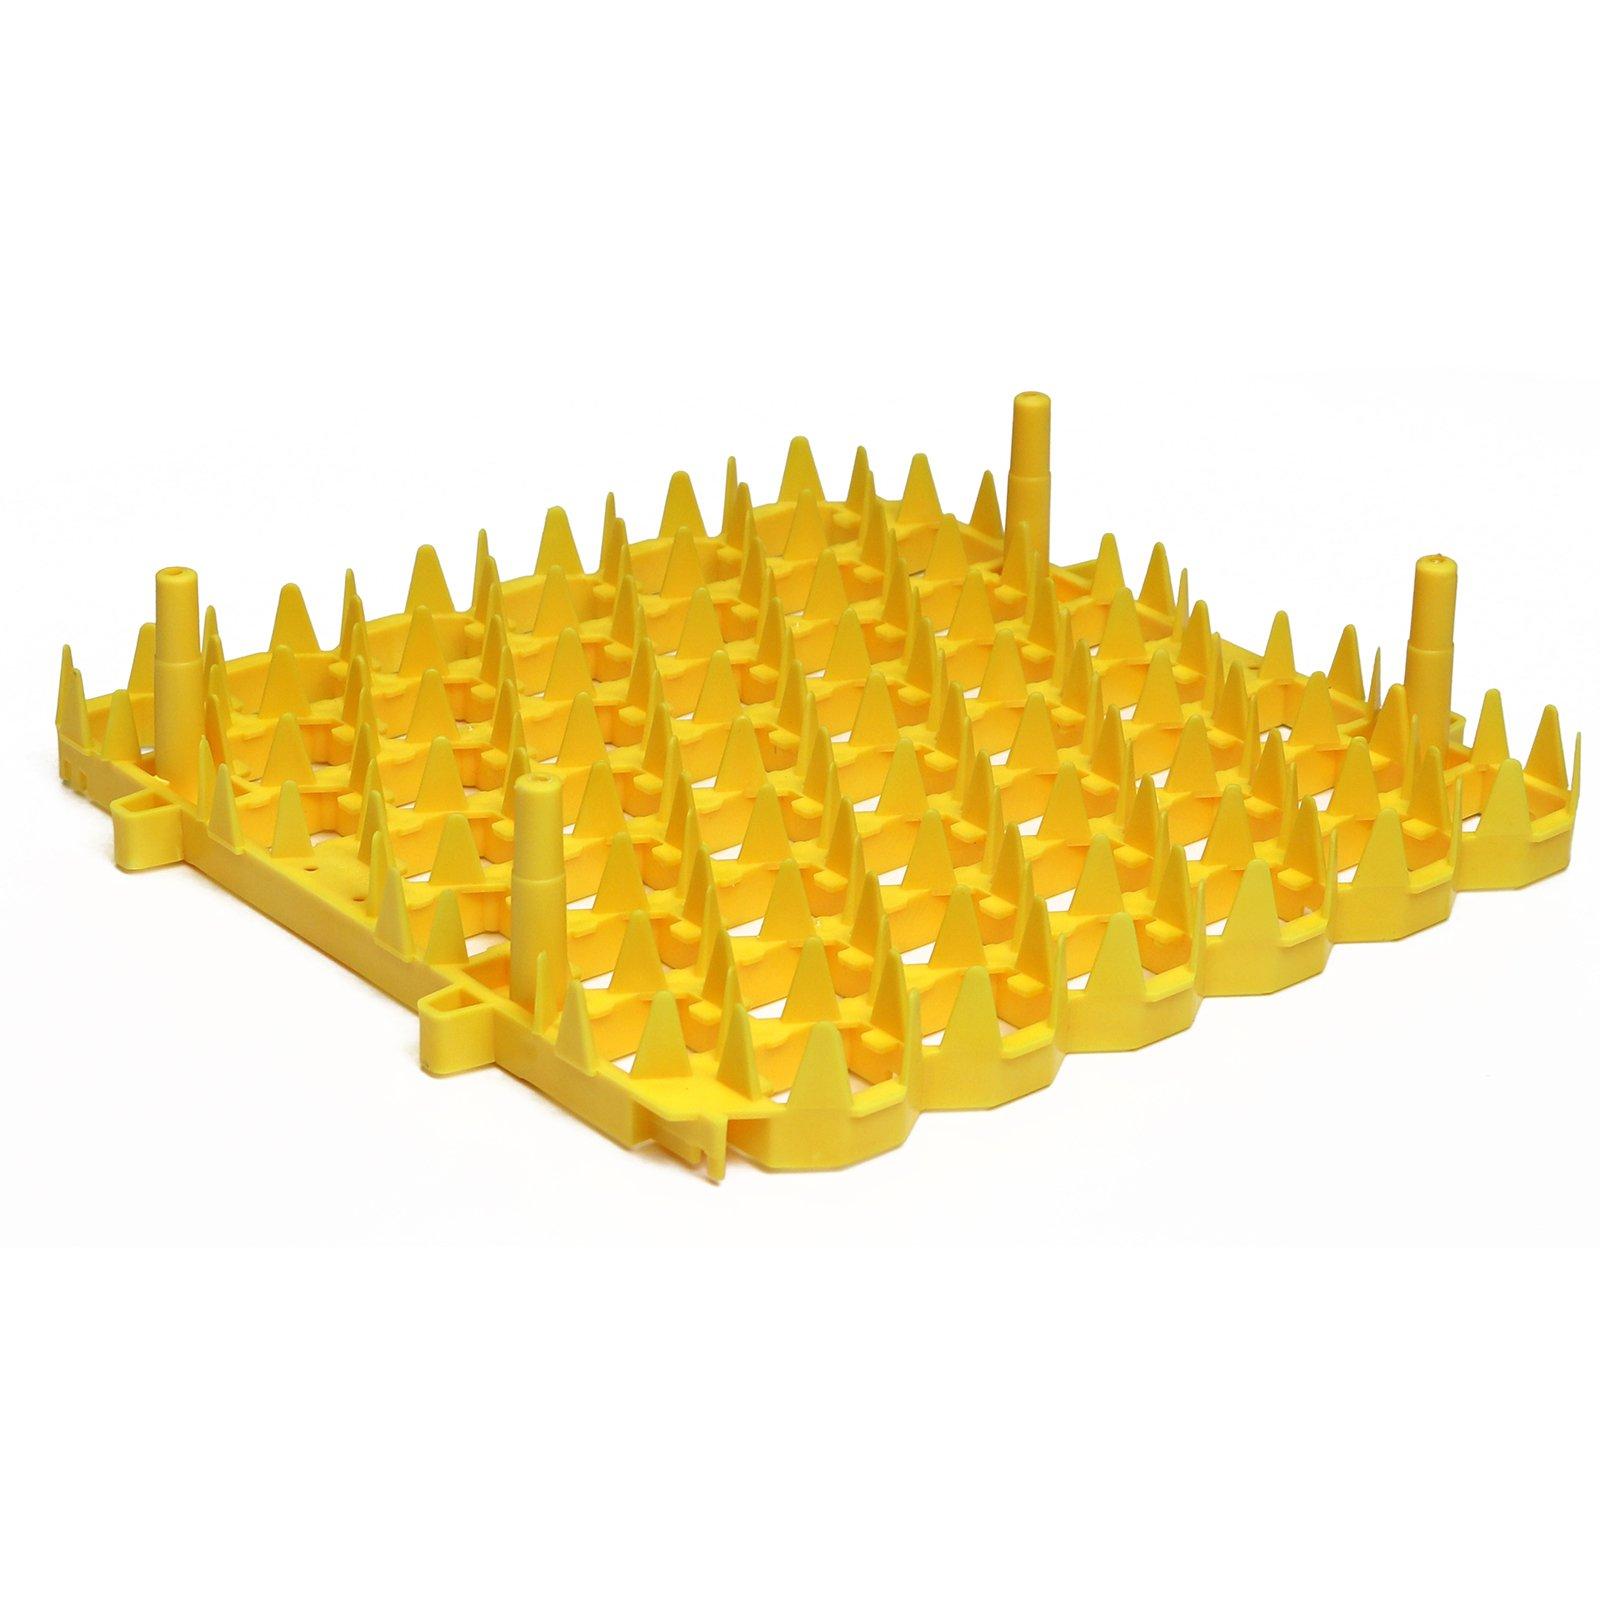 Set Of 6 Univerasl Egg Hatching Trays For Sportsman Incubators